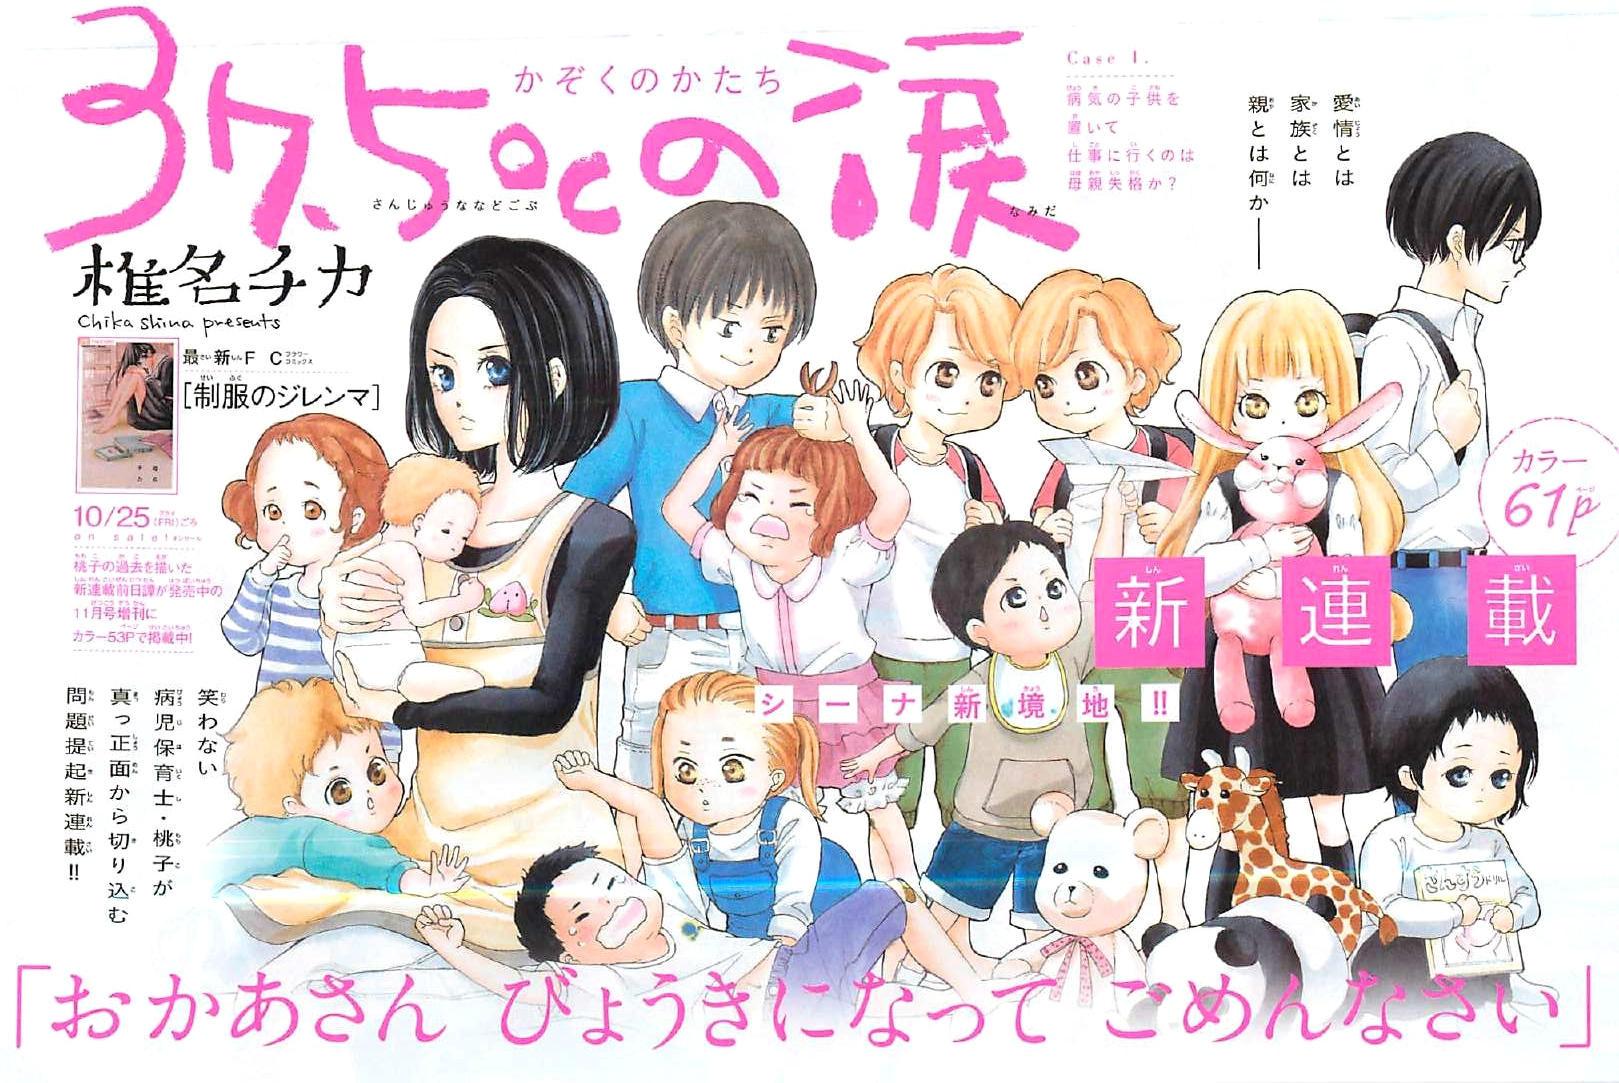 37.5-C-no-Namida Chapter 001 Page 1